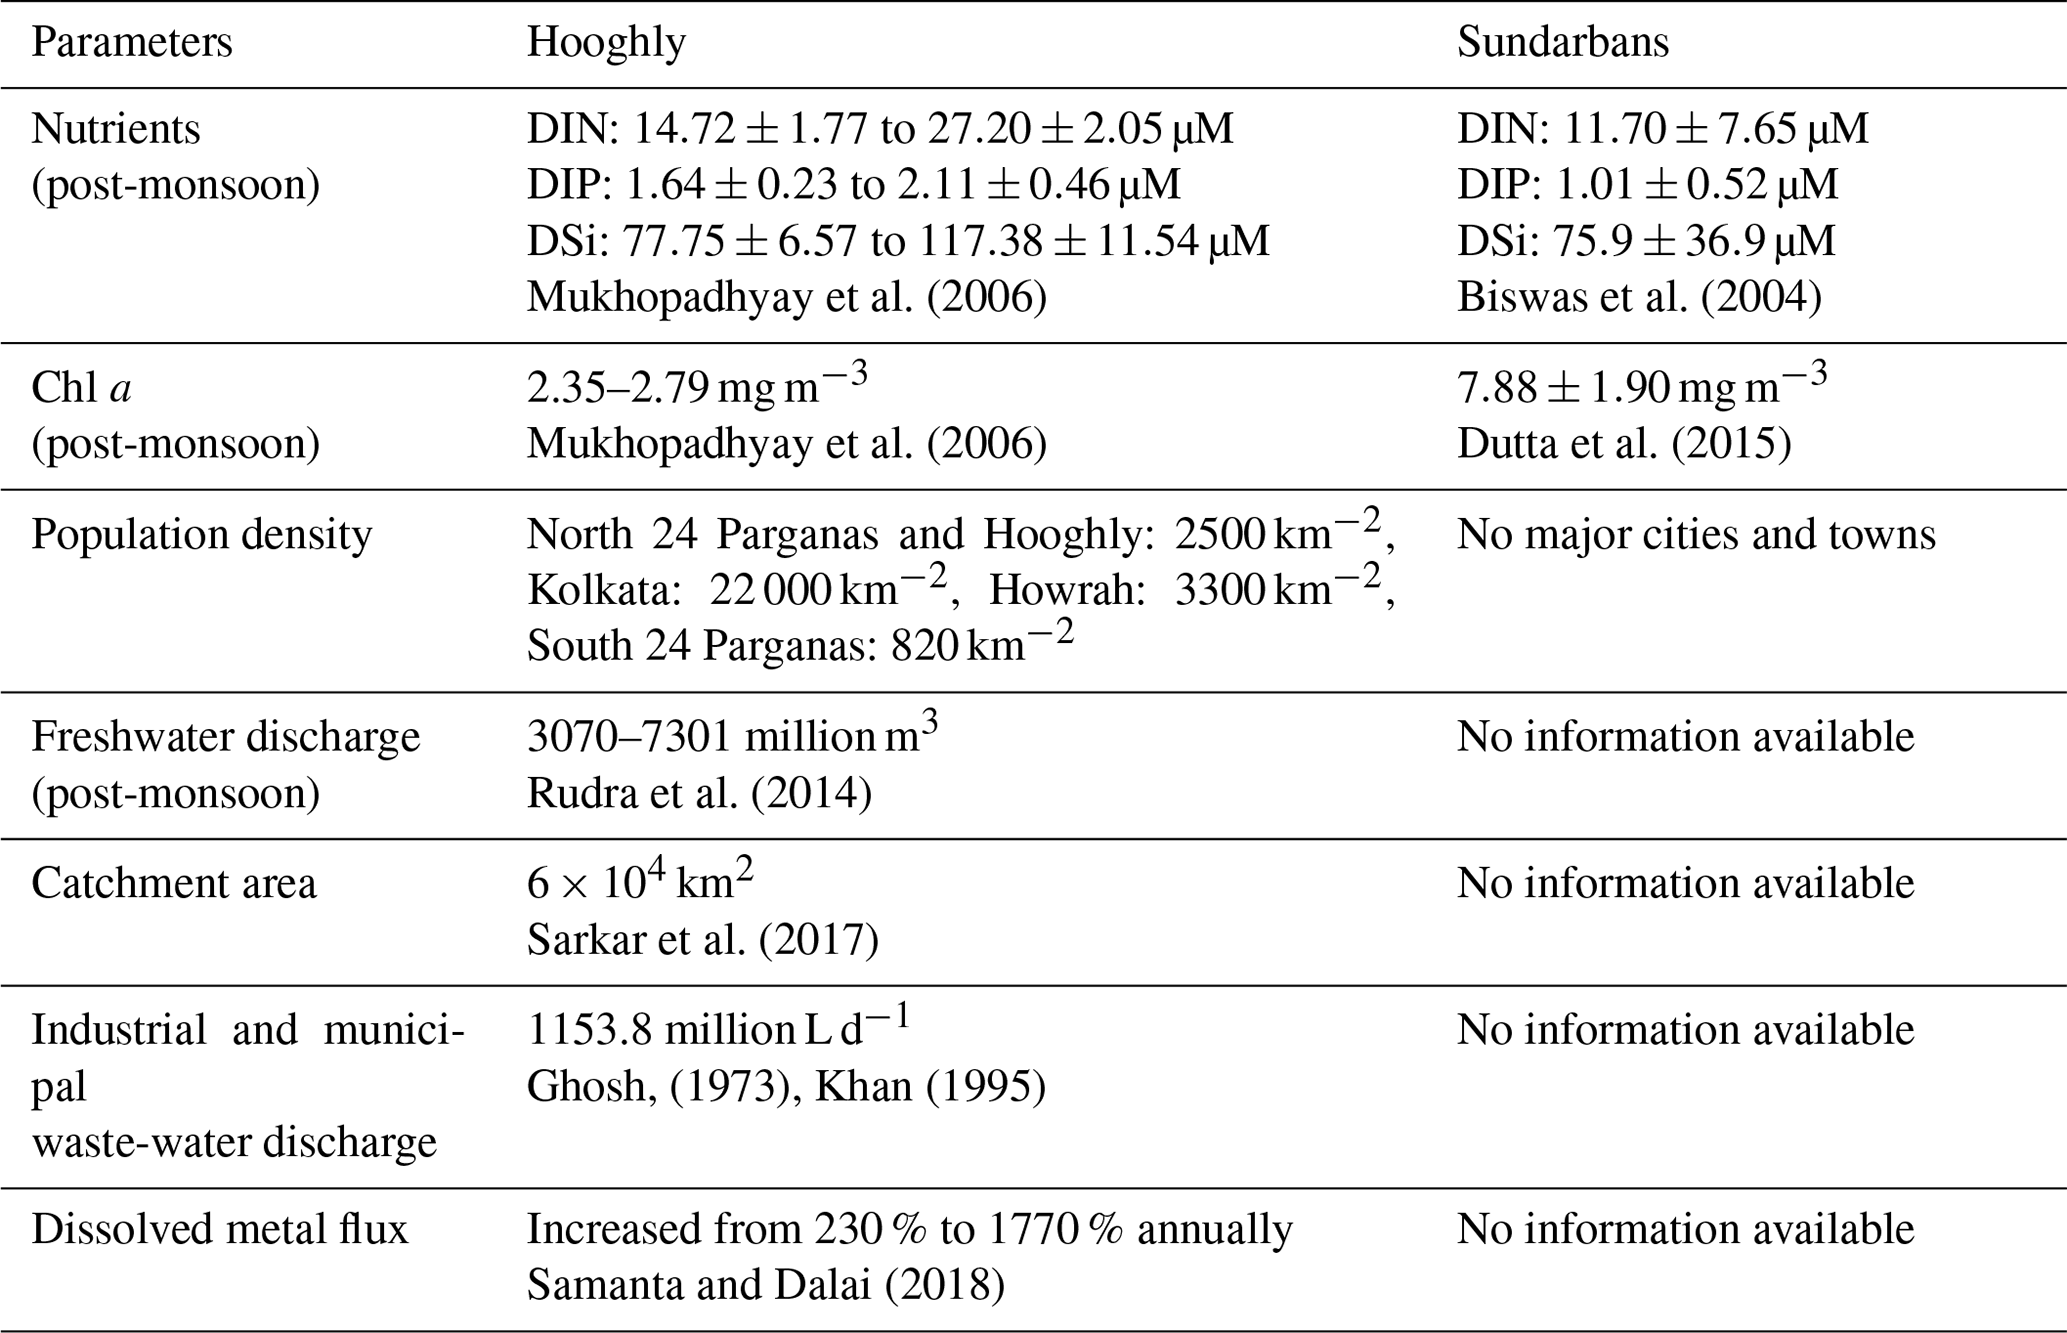 BG - The post-monsoon carbon biogeochemistry of the Hooghly